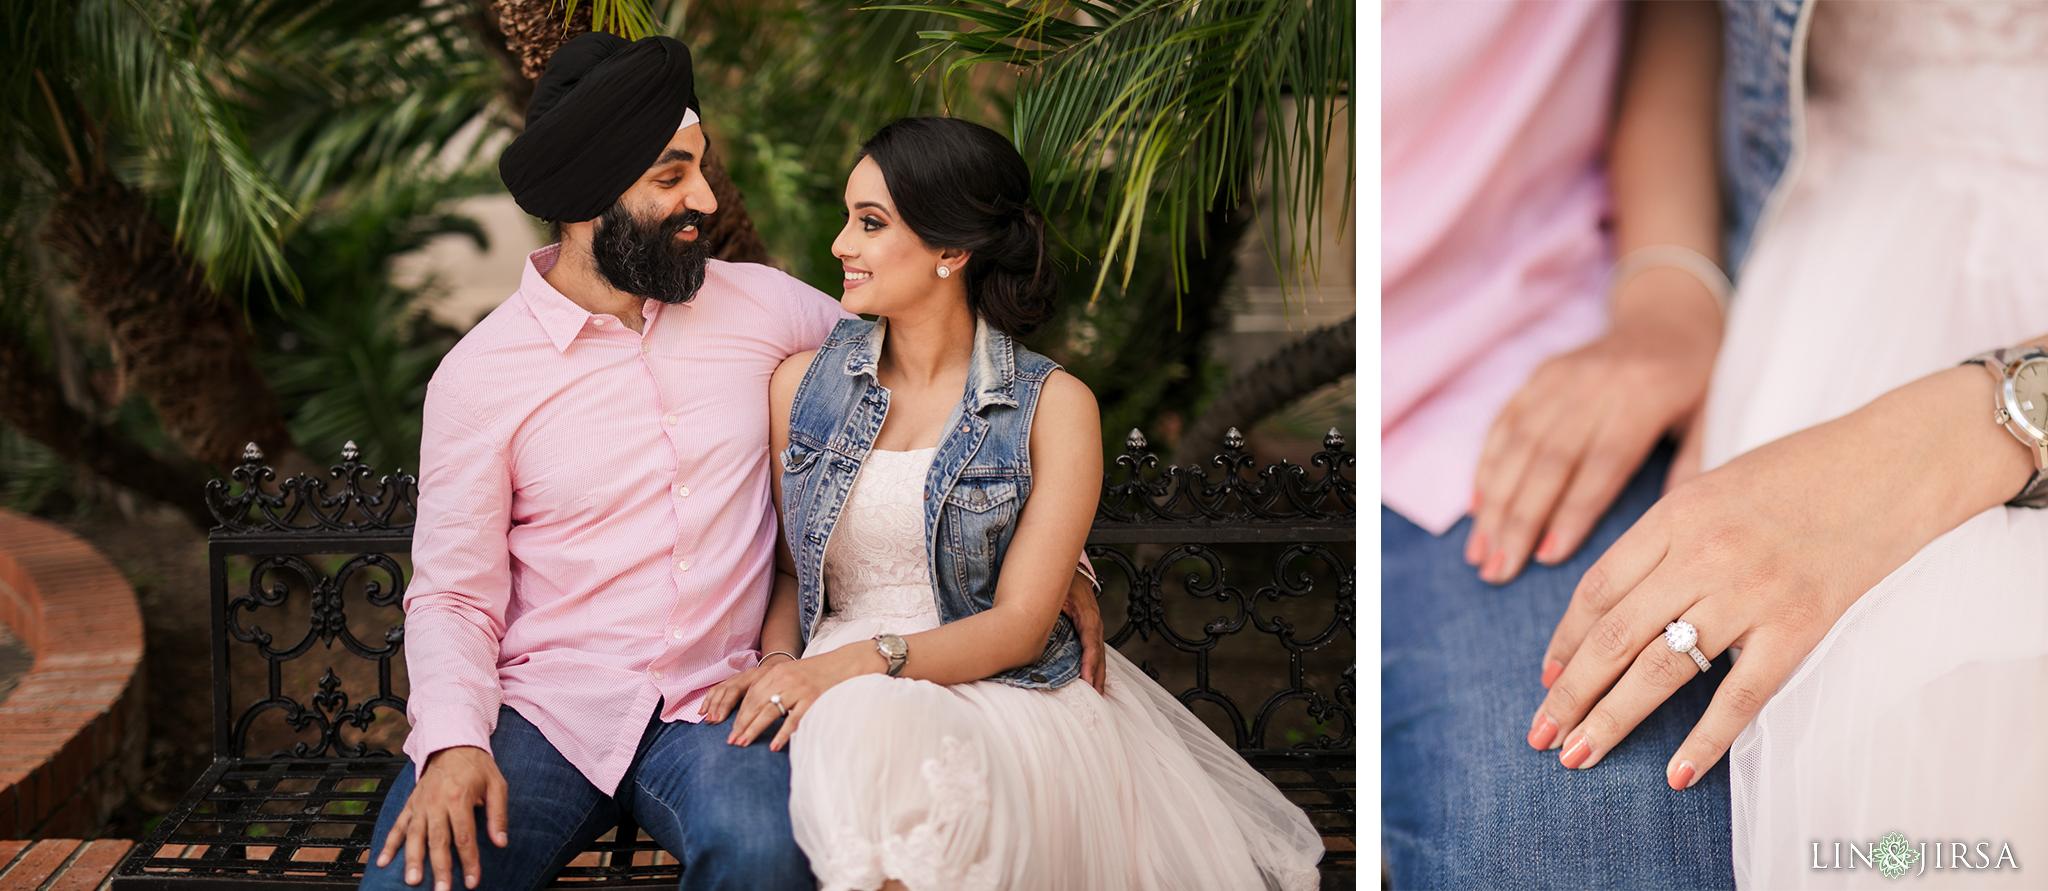 07 Balboa Park San Diego Punjabi Indian Engagement Photography